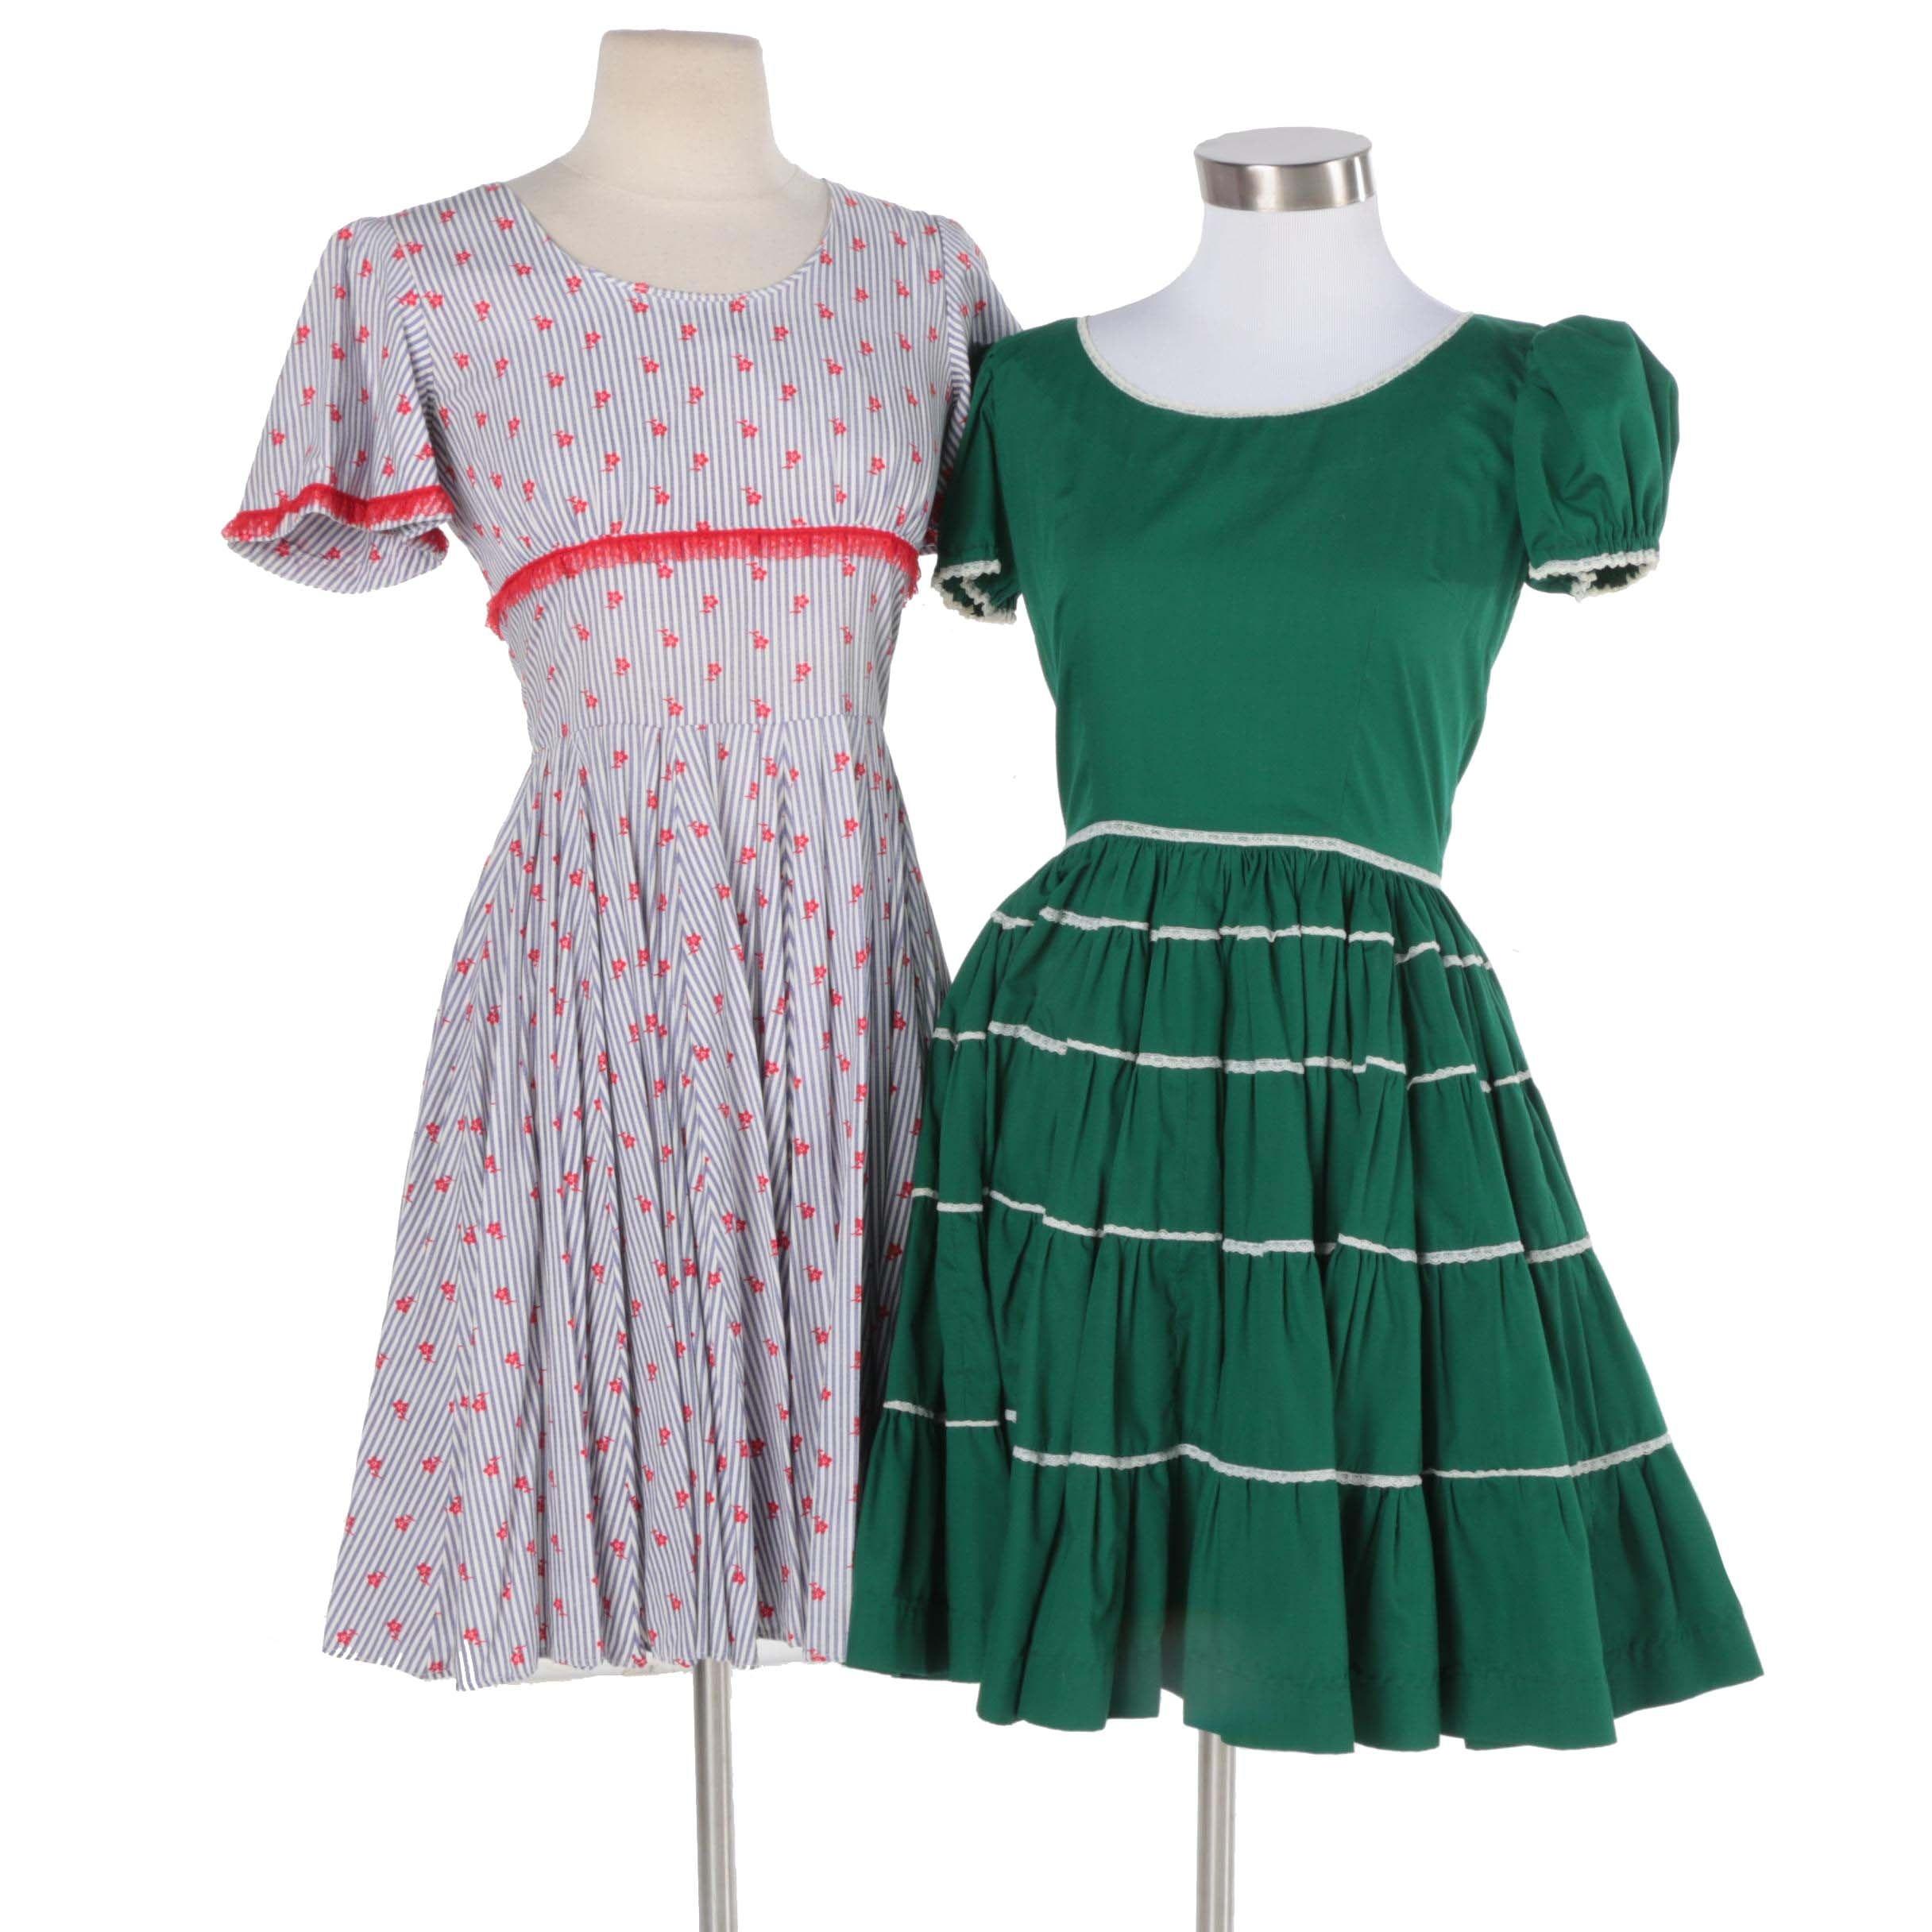 1960s Vintage Bespoke Square Dance Dresses